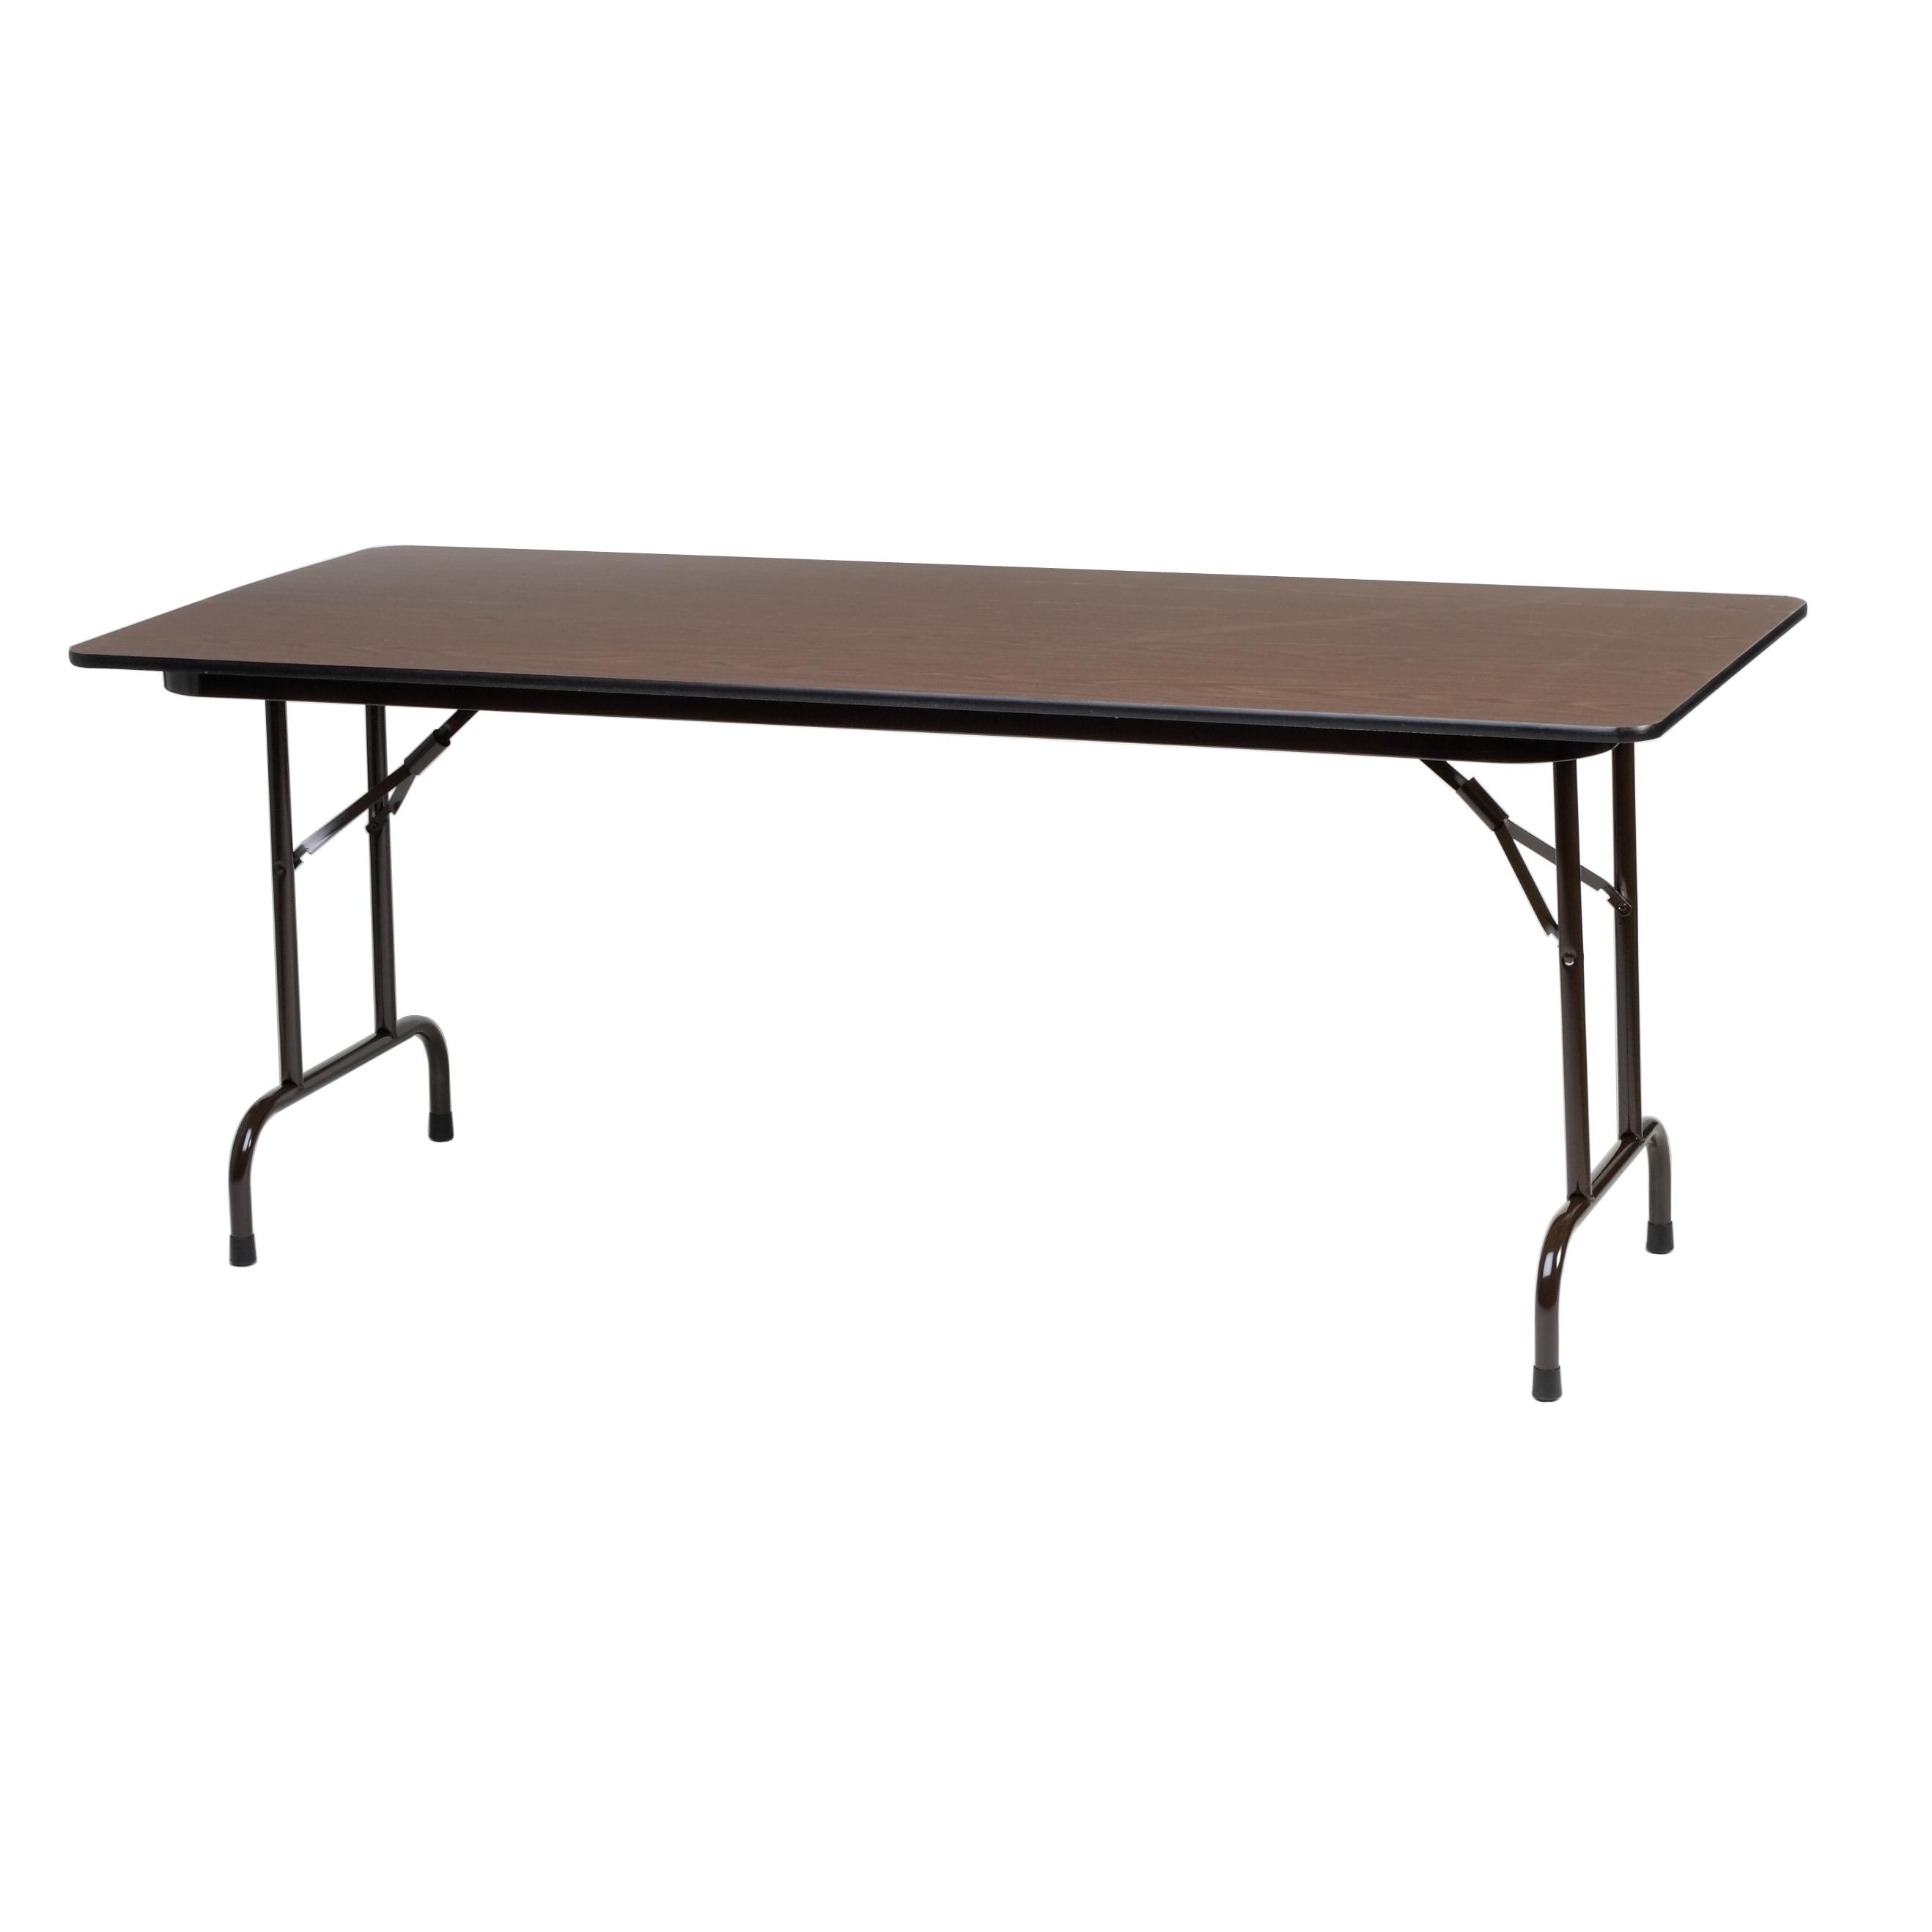 Royal Industries COR BT 3096 folding table, rectangle